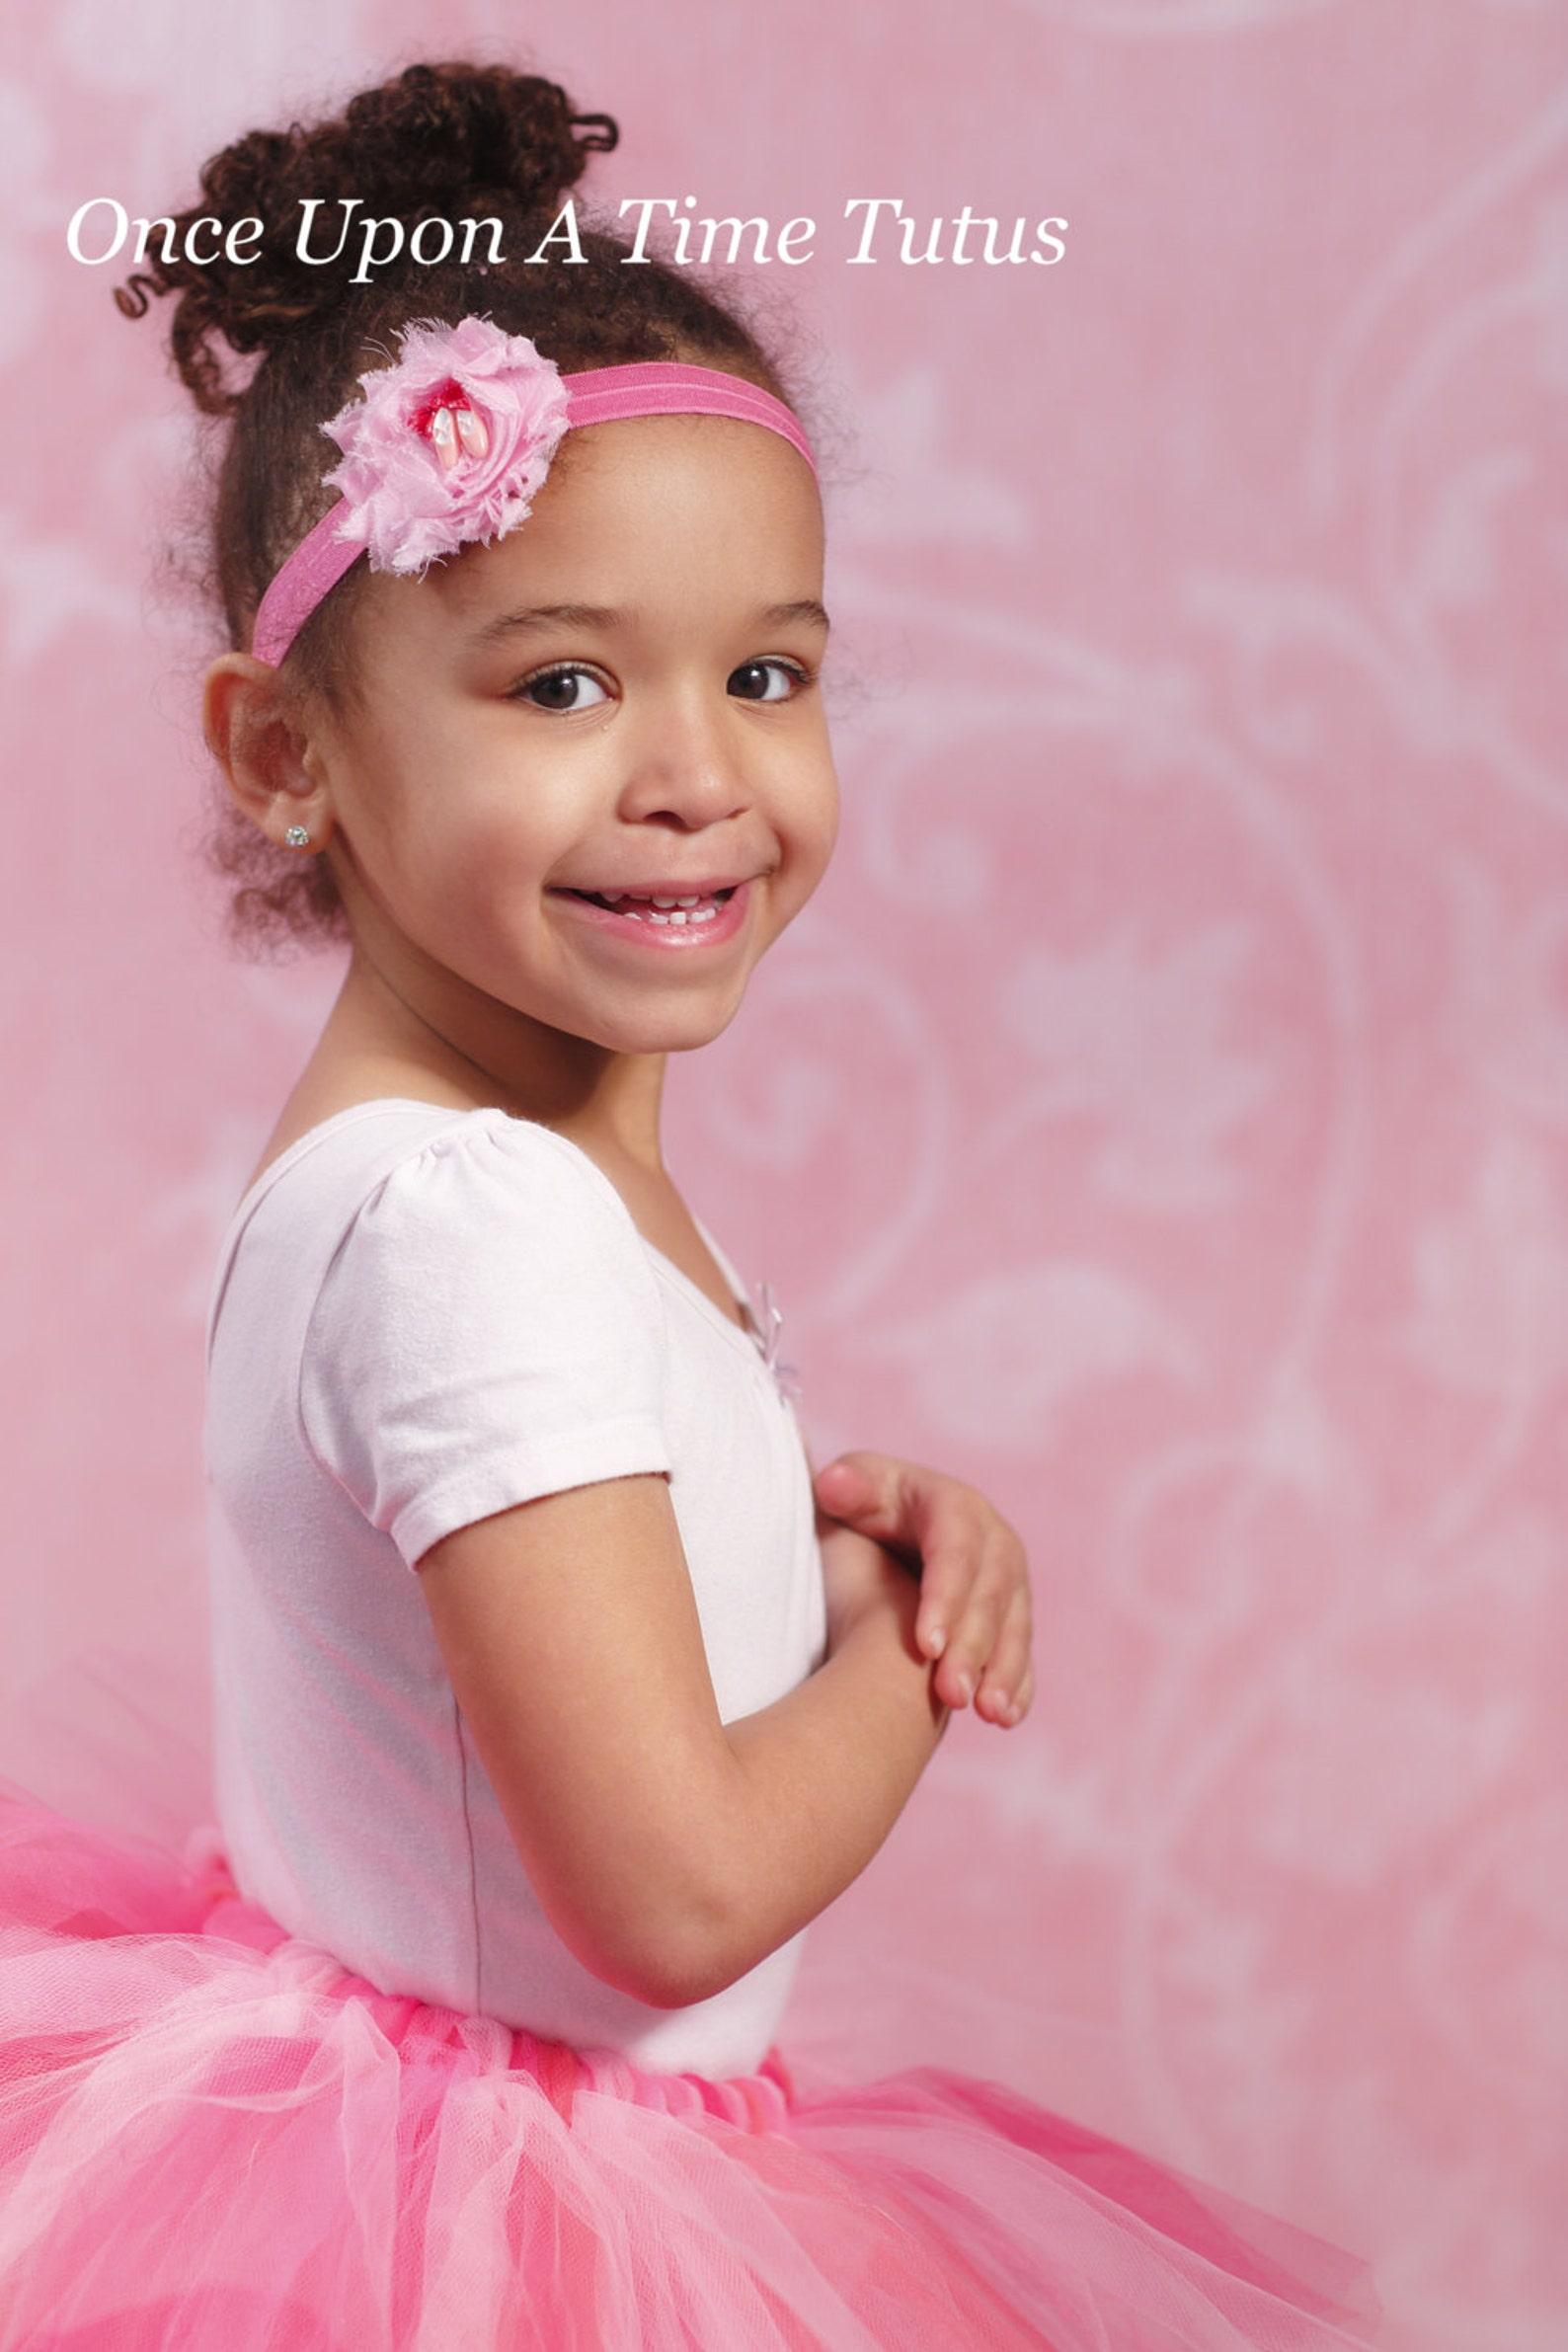 pink ballerina shoes headband - ballet girl ballerina hairbow - newborn baby little girl photo prop - light and hot pink shabby